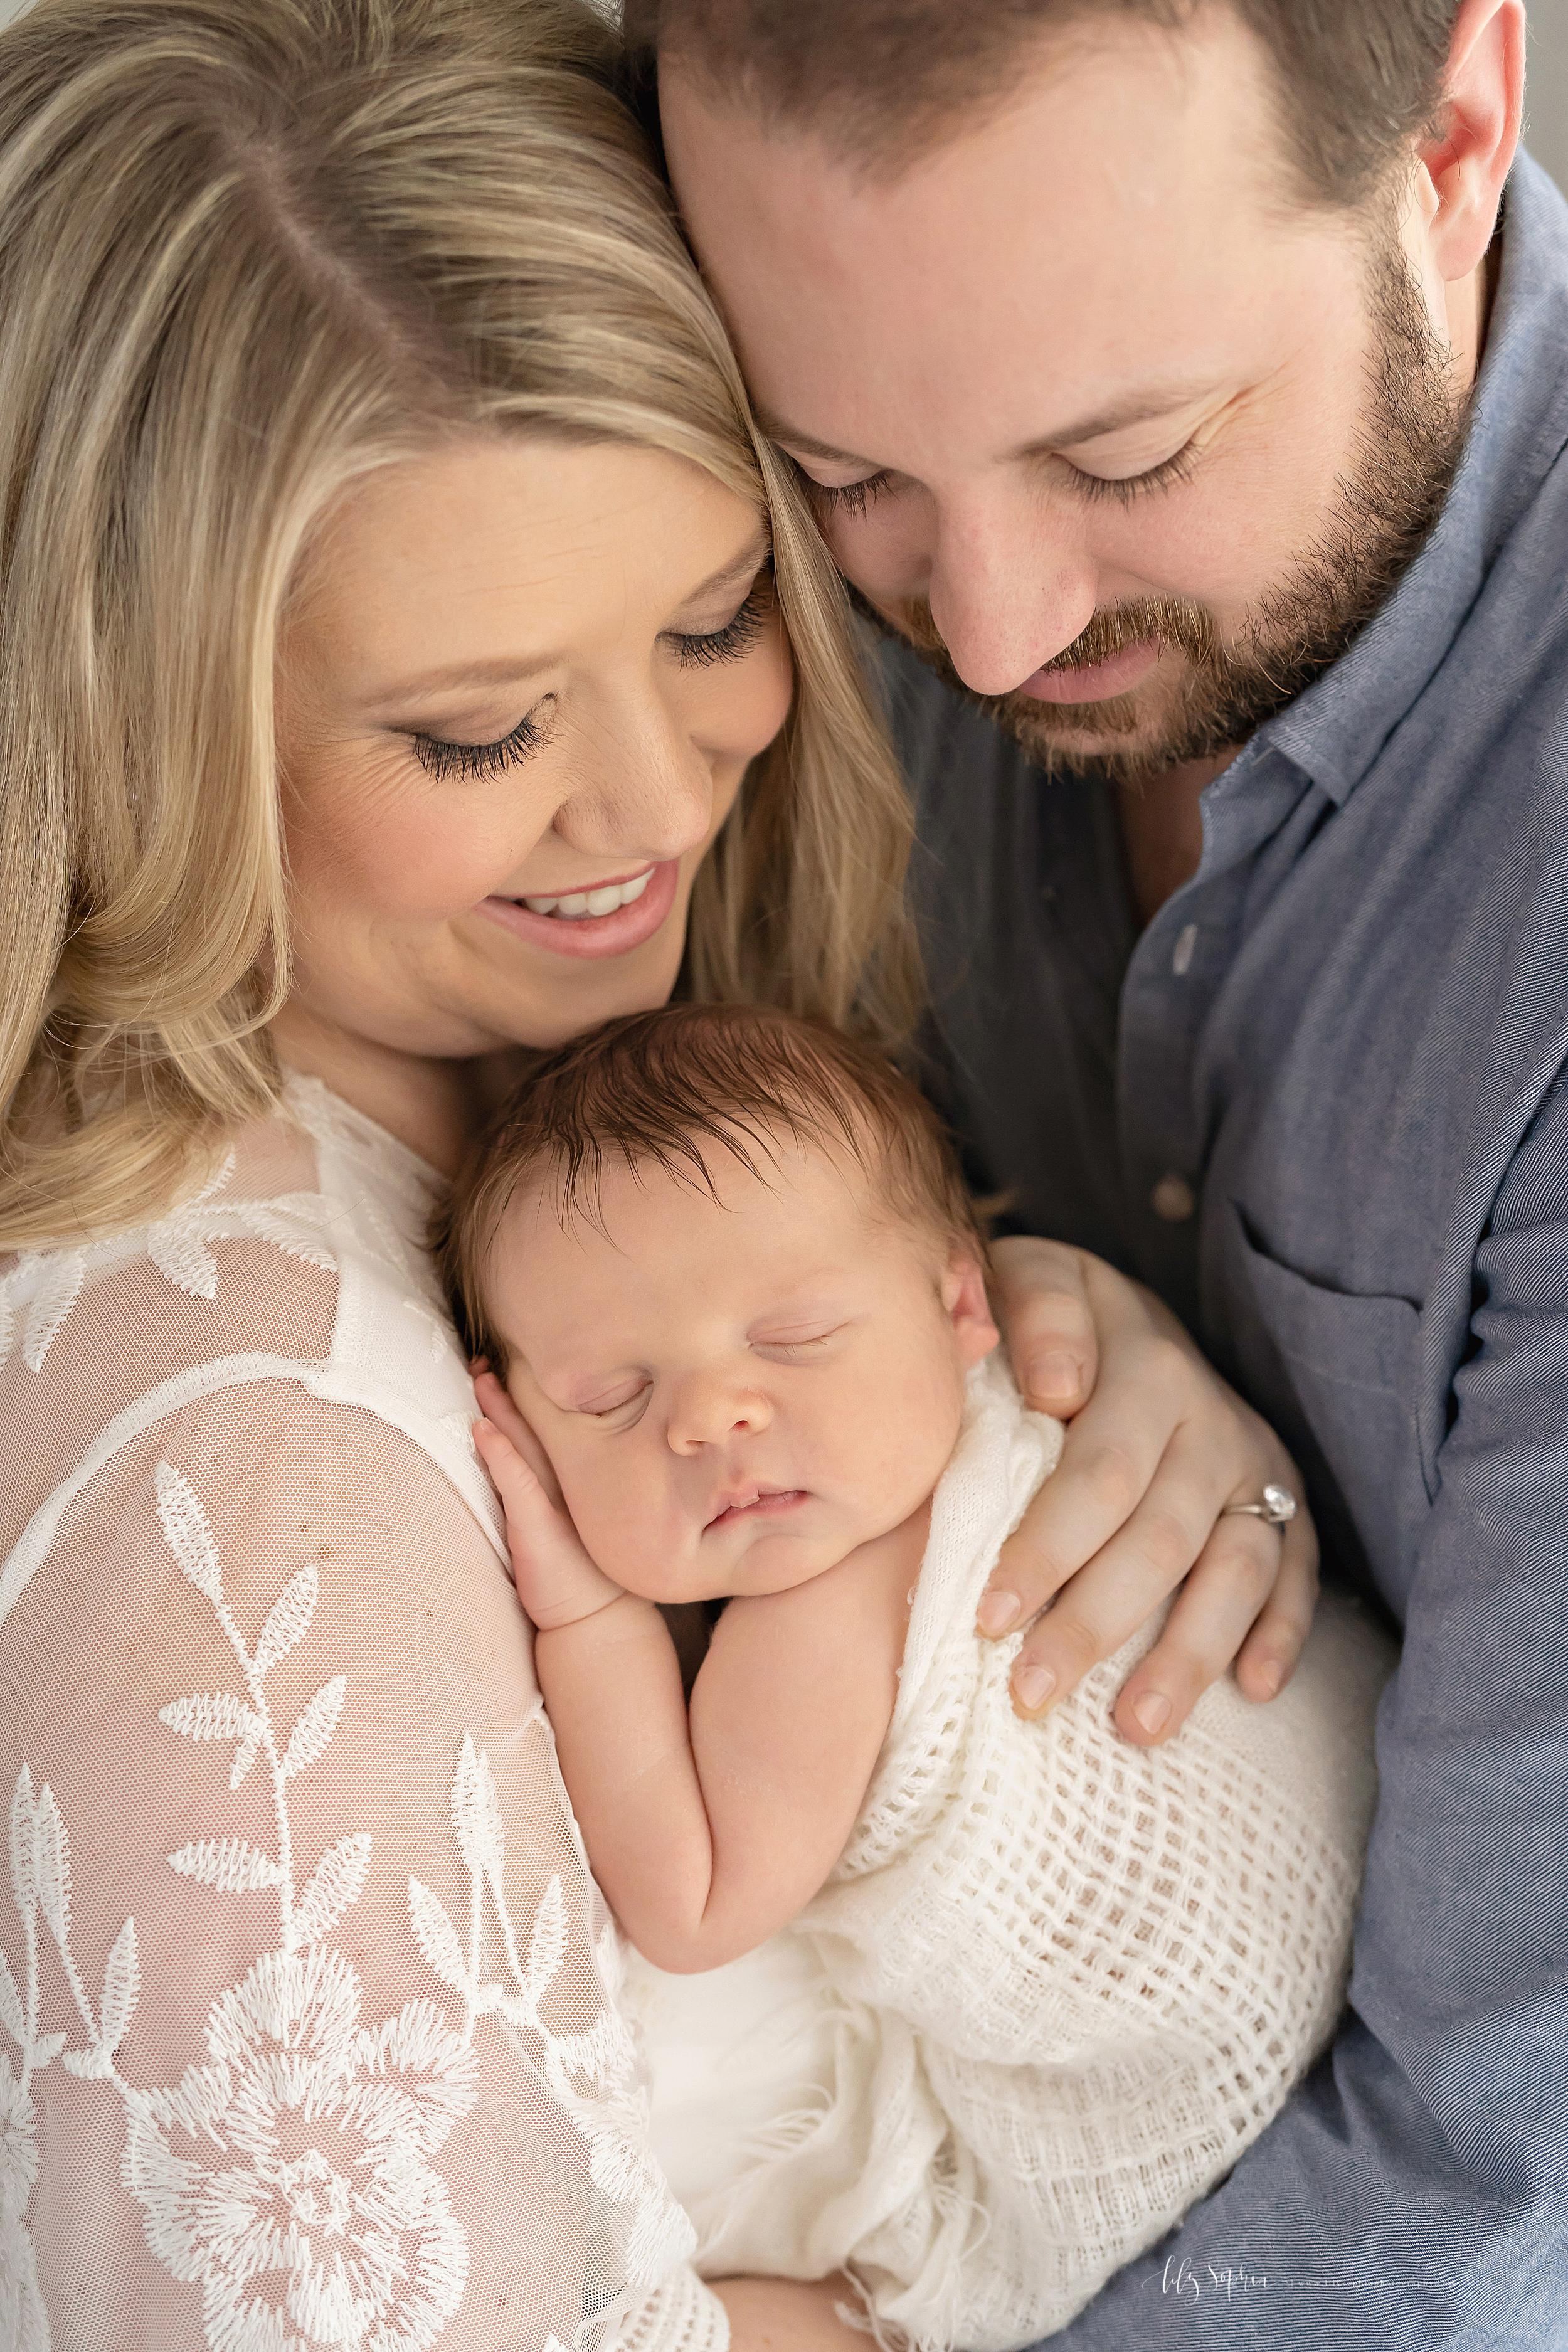 atlanta-midtown-brookhaven-ashford-dunwoody-virginia-highlands-roswell-decatur-lily-sophia-photography-newborn-baby-boy-big-brother-family-studio-session_0634.jpg